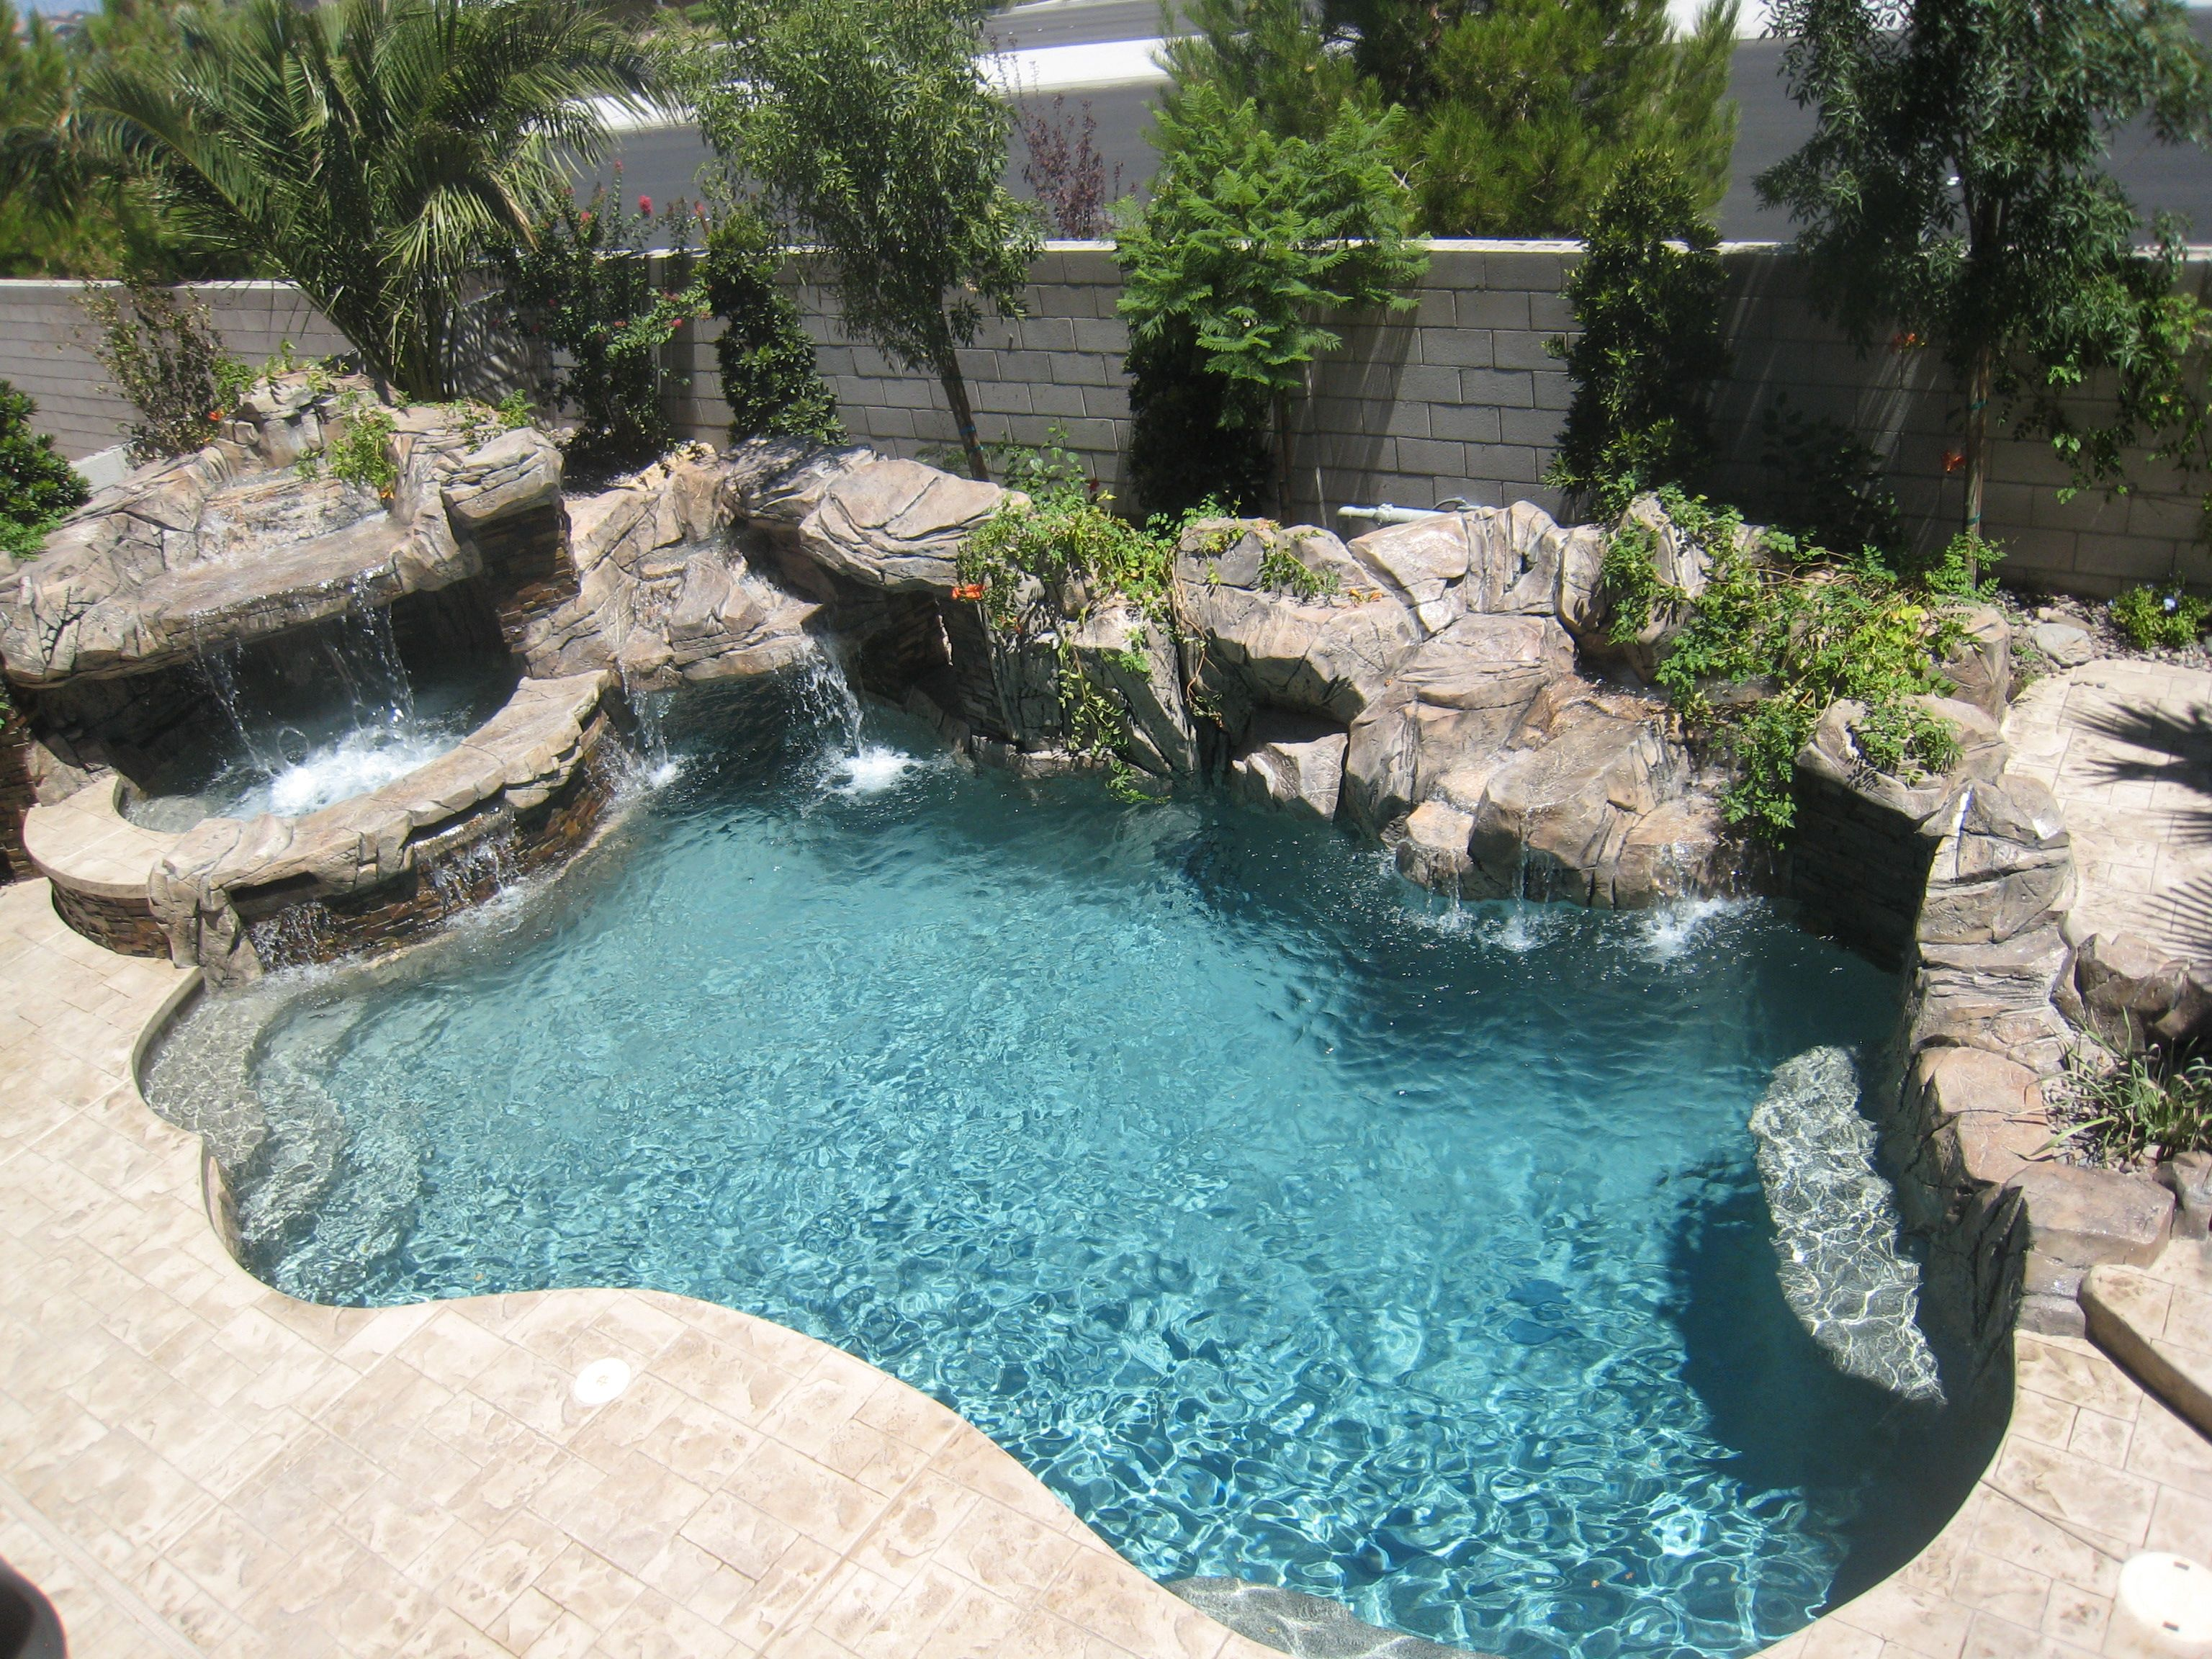 Image Result For Fiberglass Pool With Boulders Backyard Pool